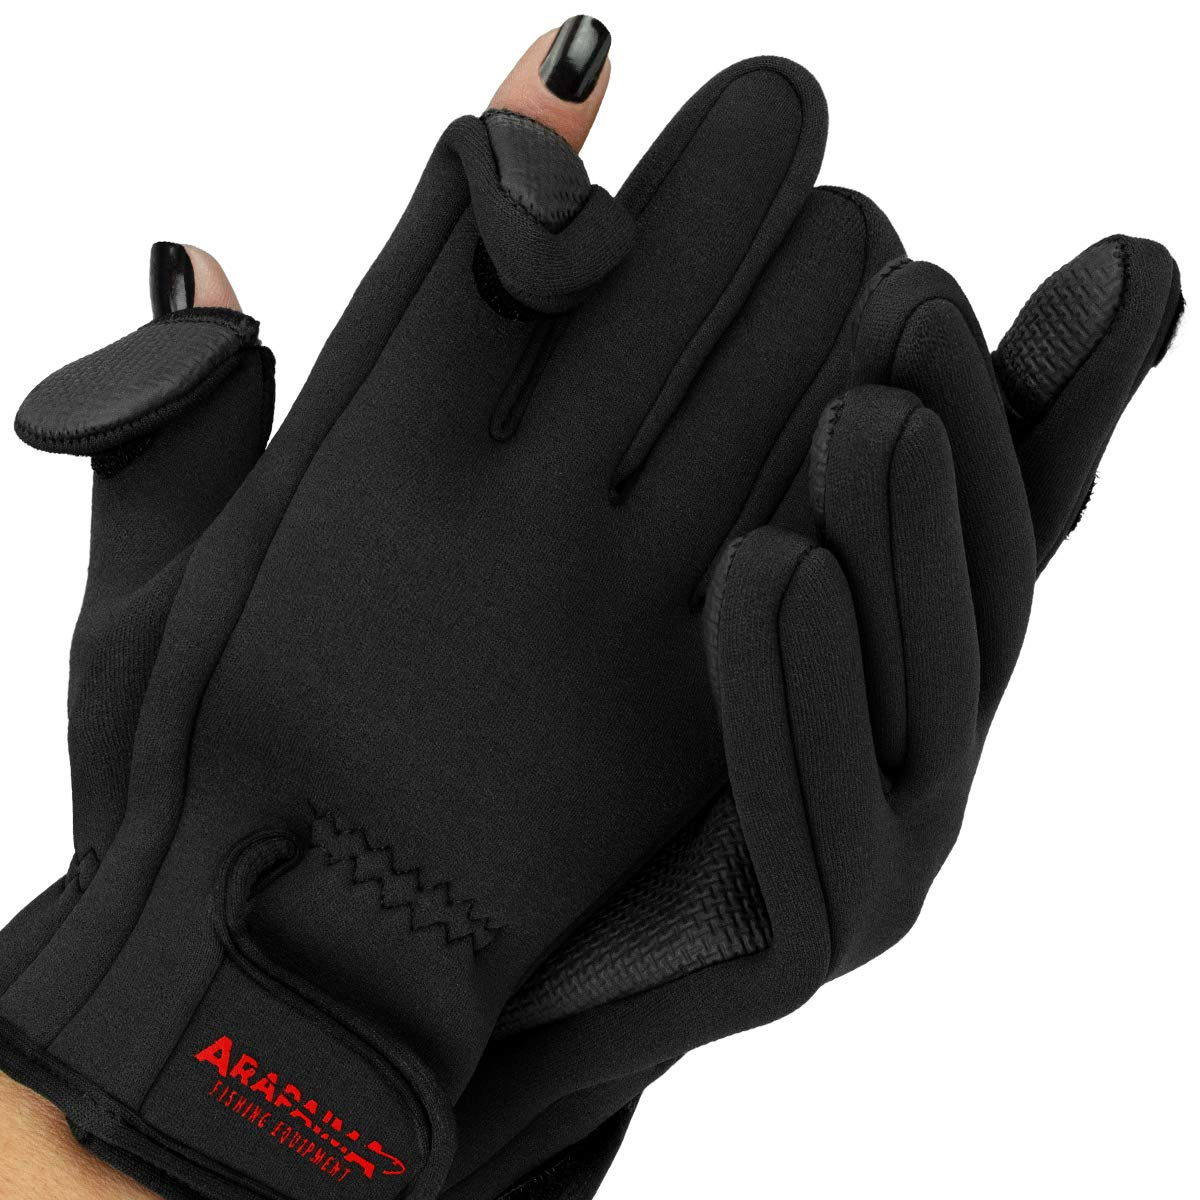 Neopren Angel Handschuhe Fishing Gloves Thermo Angelhandschuhe Spin Anglerhandschuhe